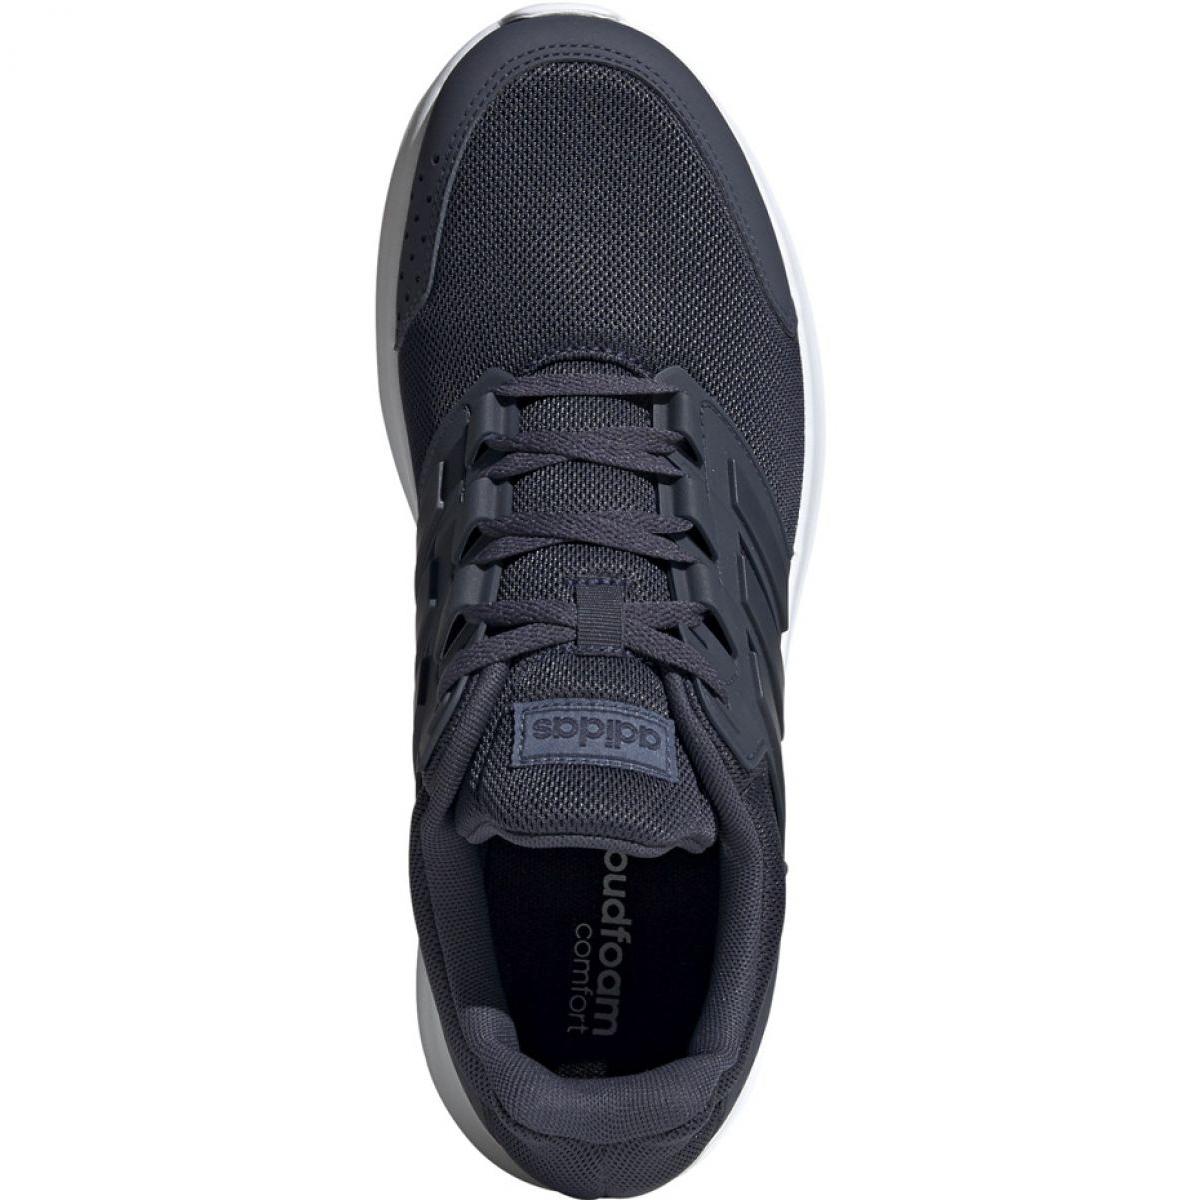 Marina M Adidas Zapatillas Ee7915 Galaxy 4 13TJculKF